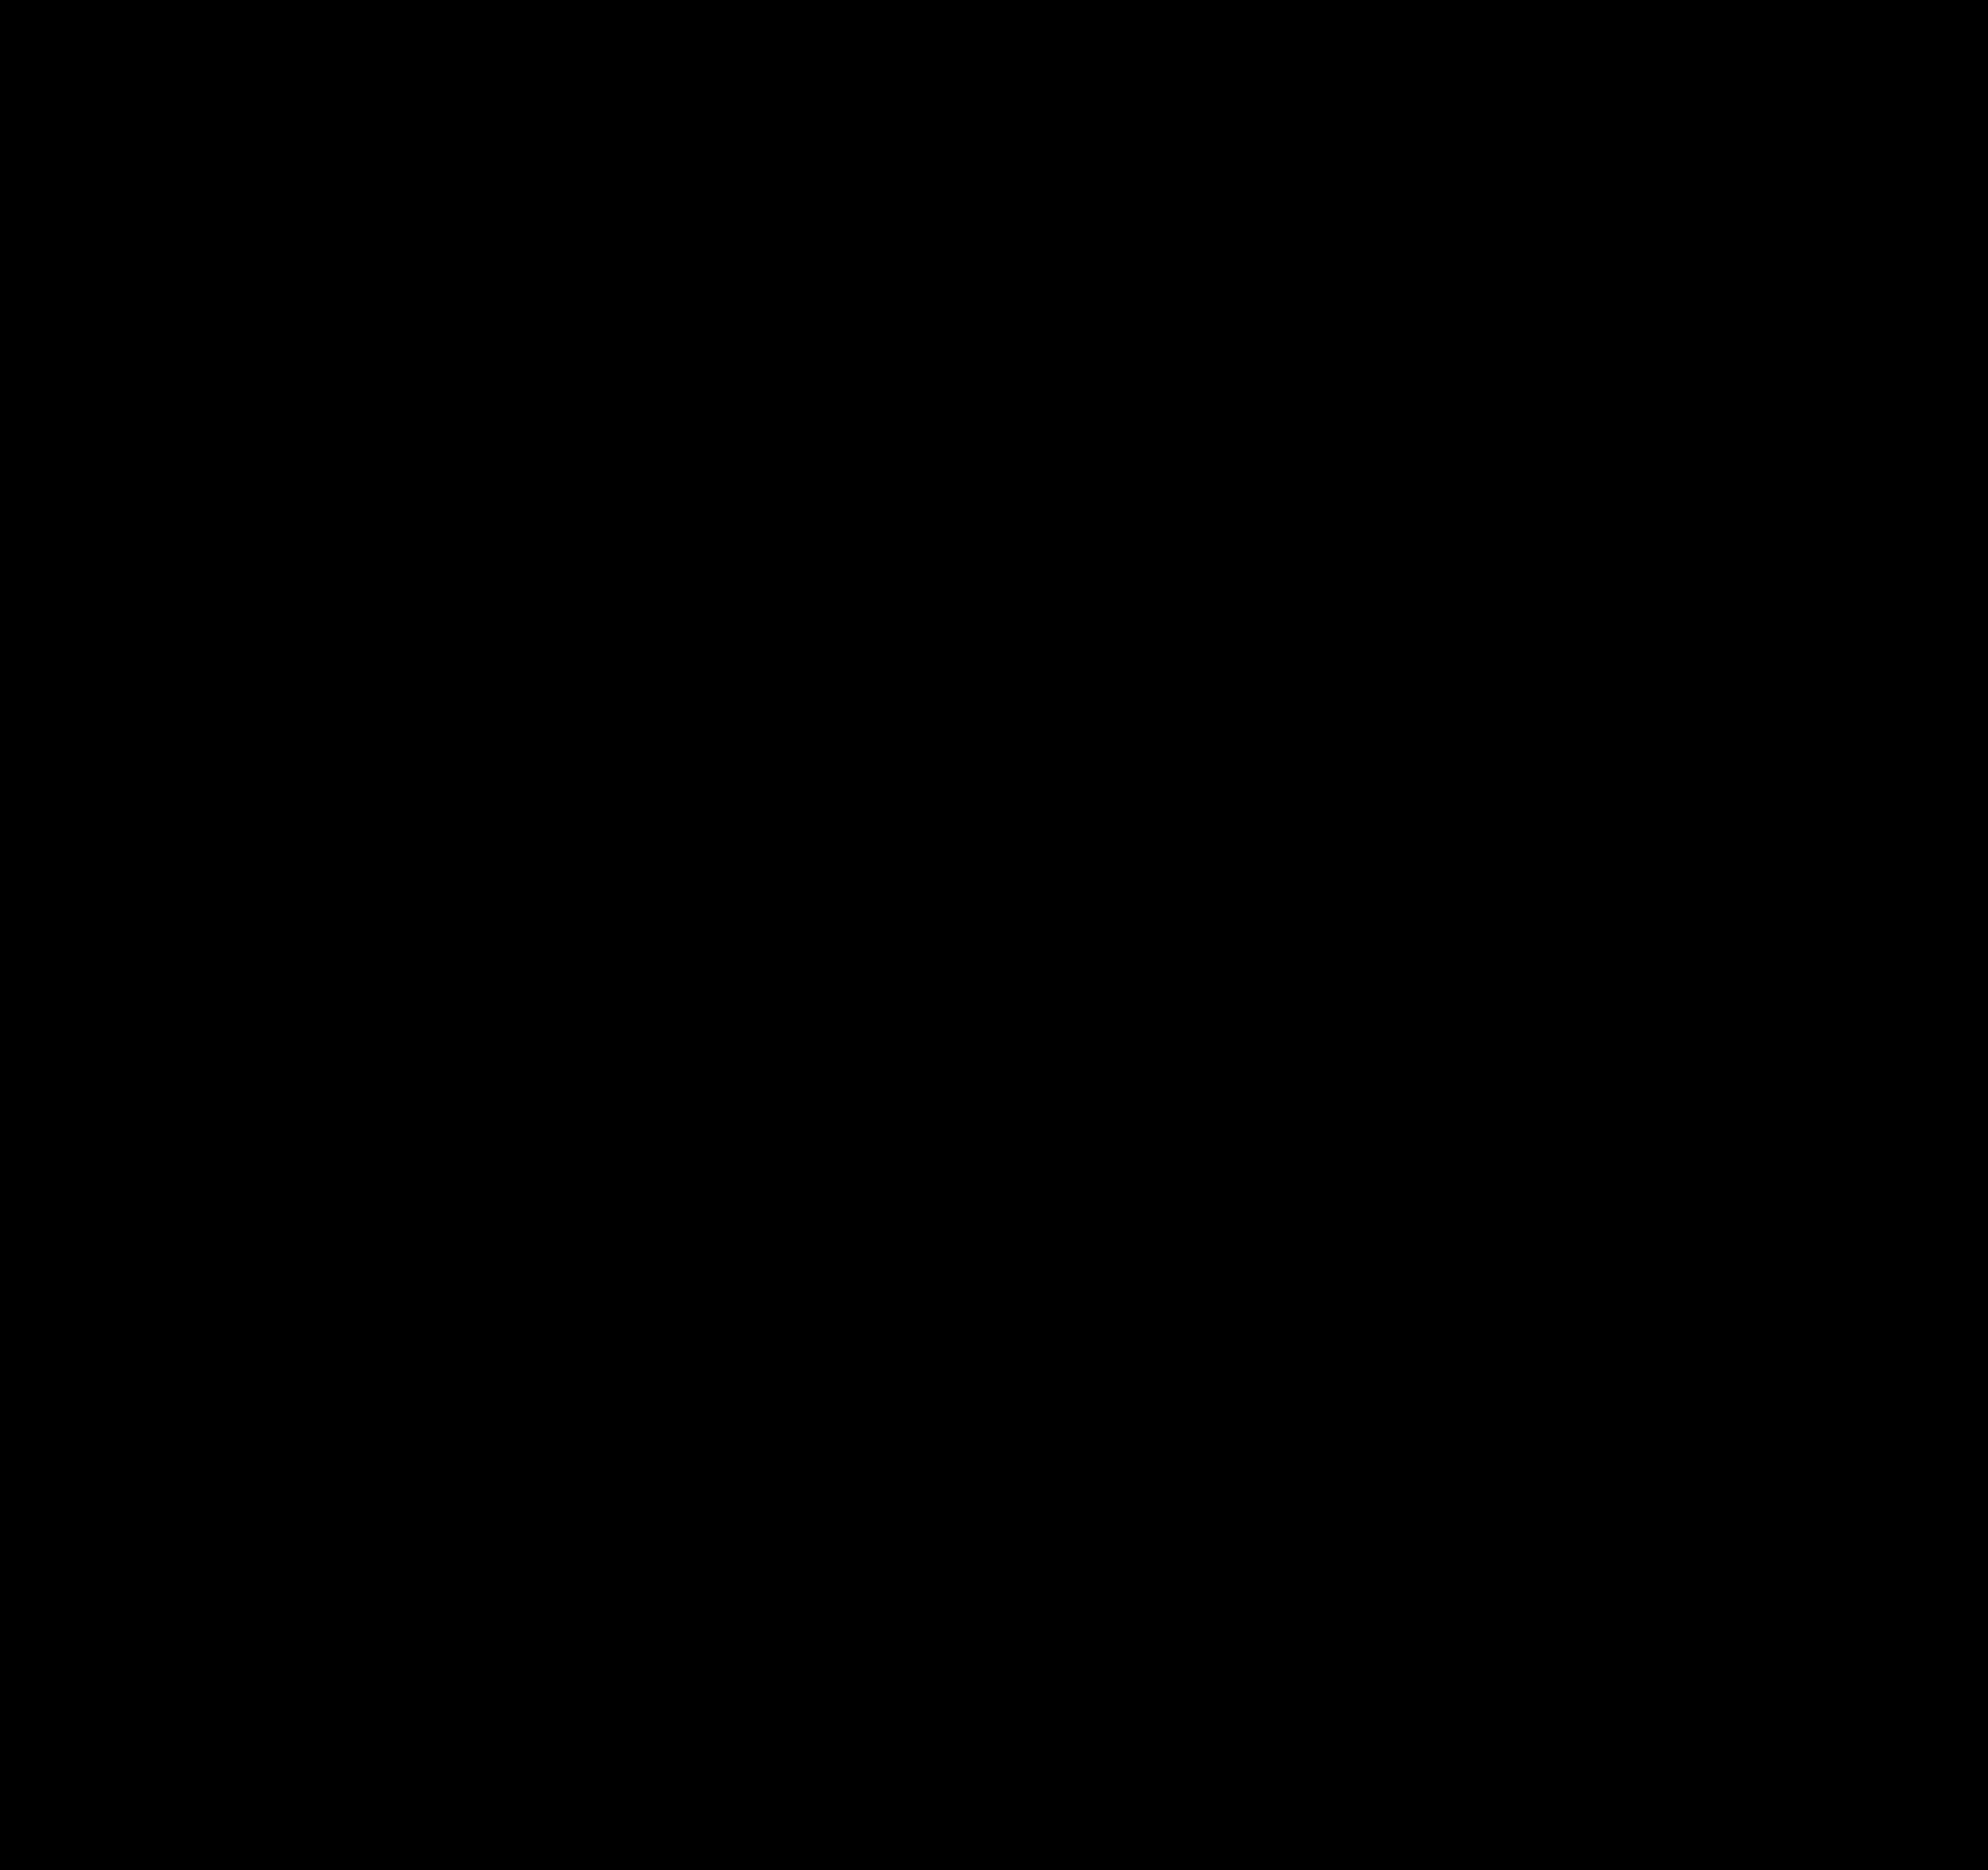 2400x2257 Log Cabin Black White Clipart